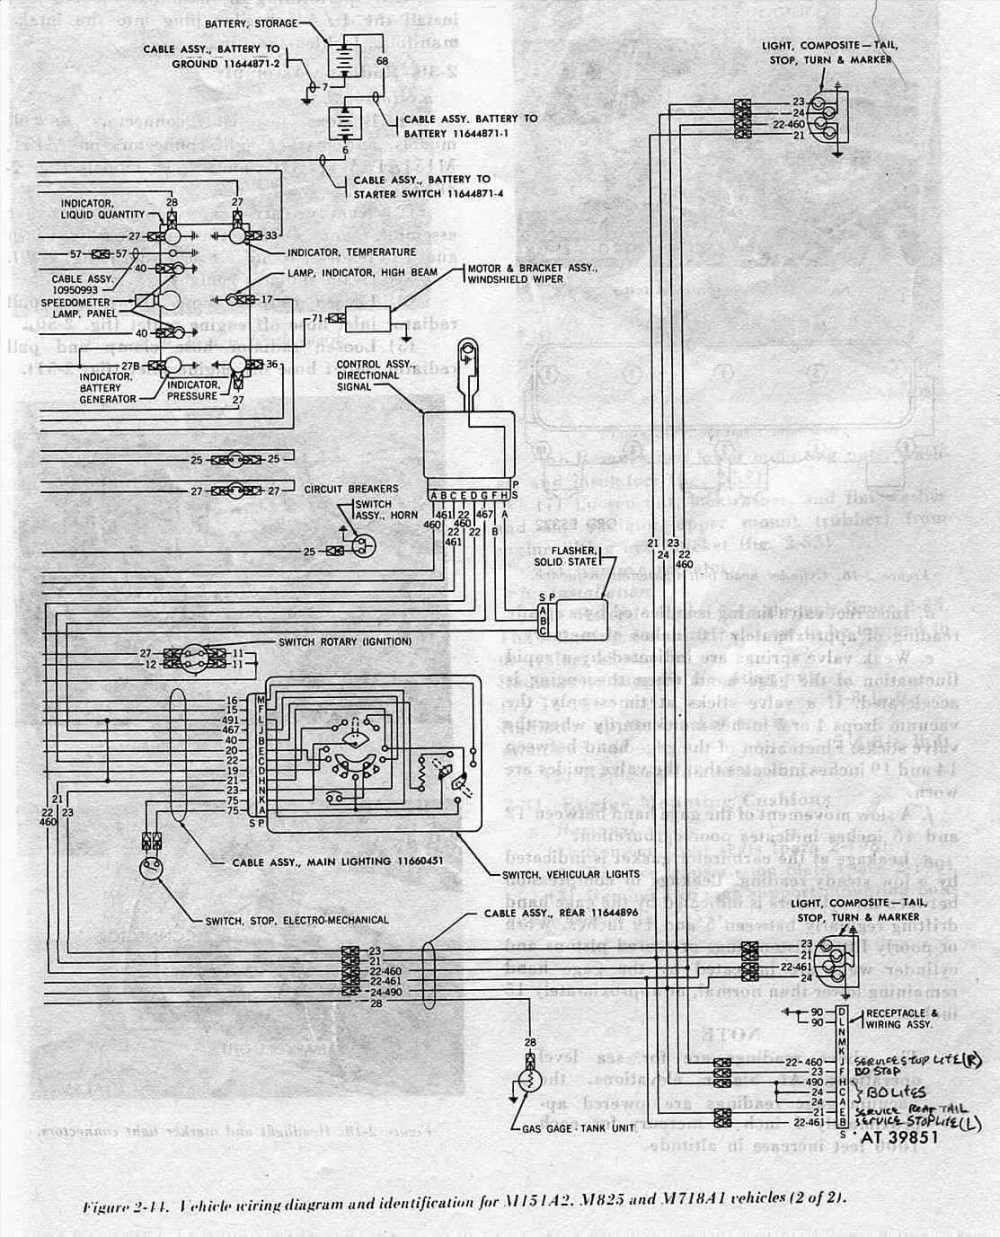 medium resolution of m151a2 wiring diagram wiring diagram third level rh 17 6 22 jacobwinterstein com military m35 wiring diagram wiring lighted doorbell button